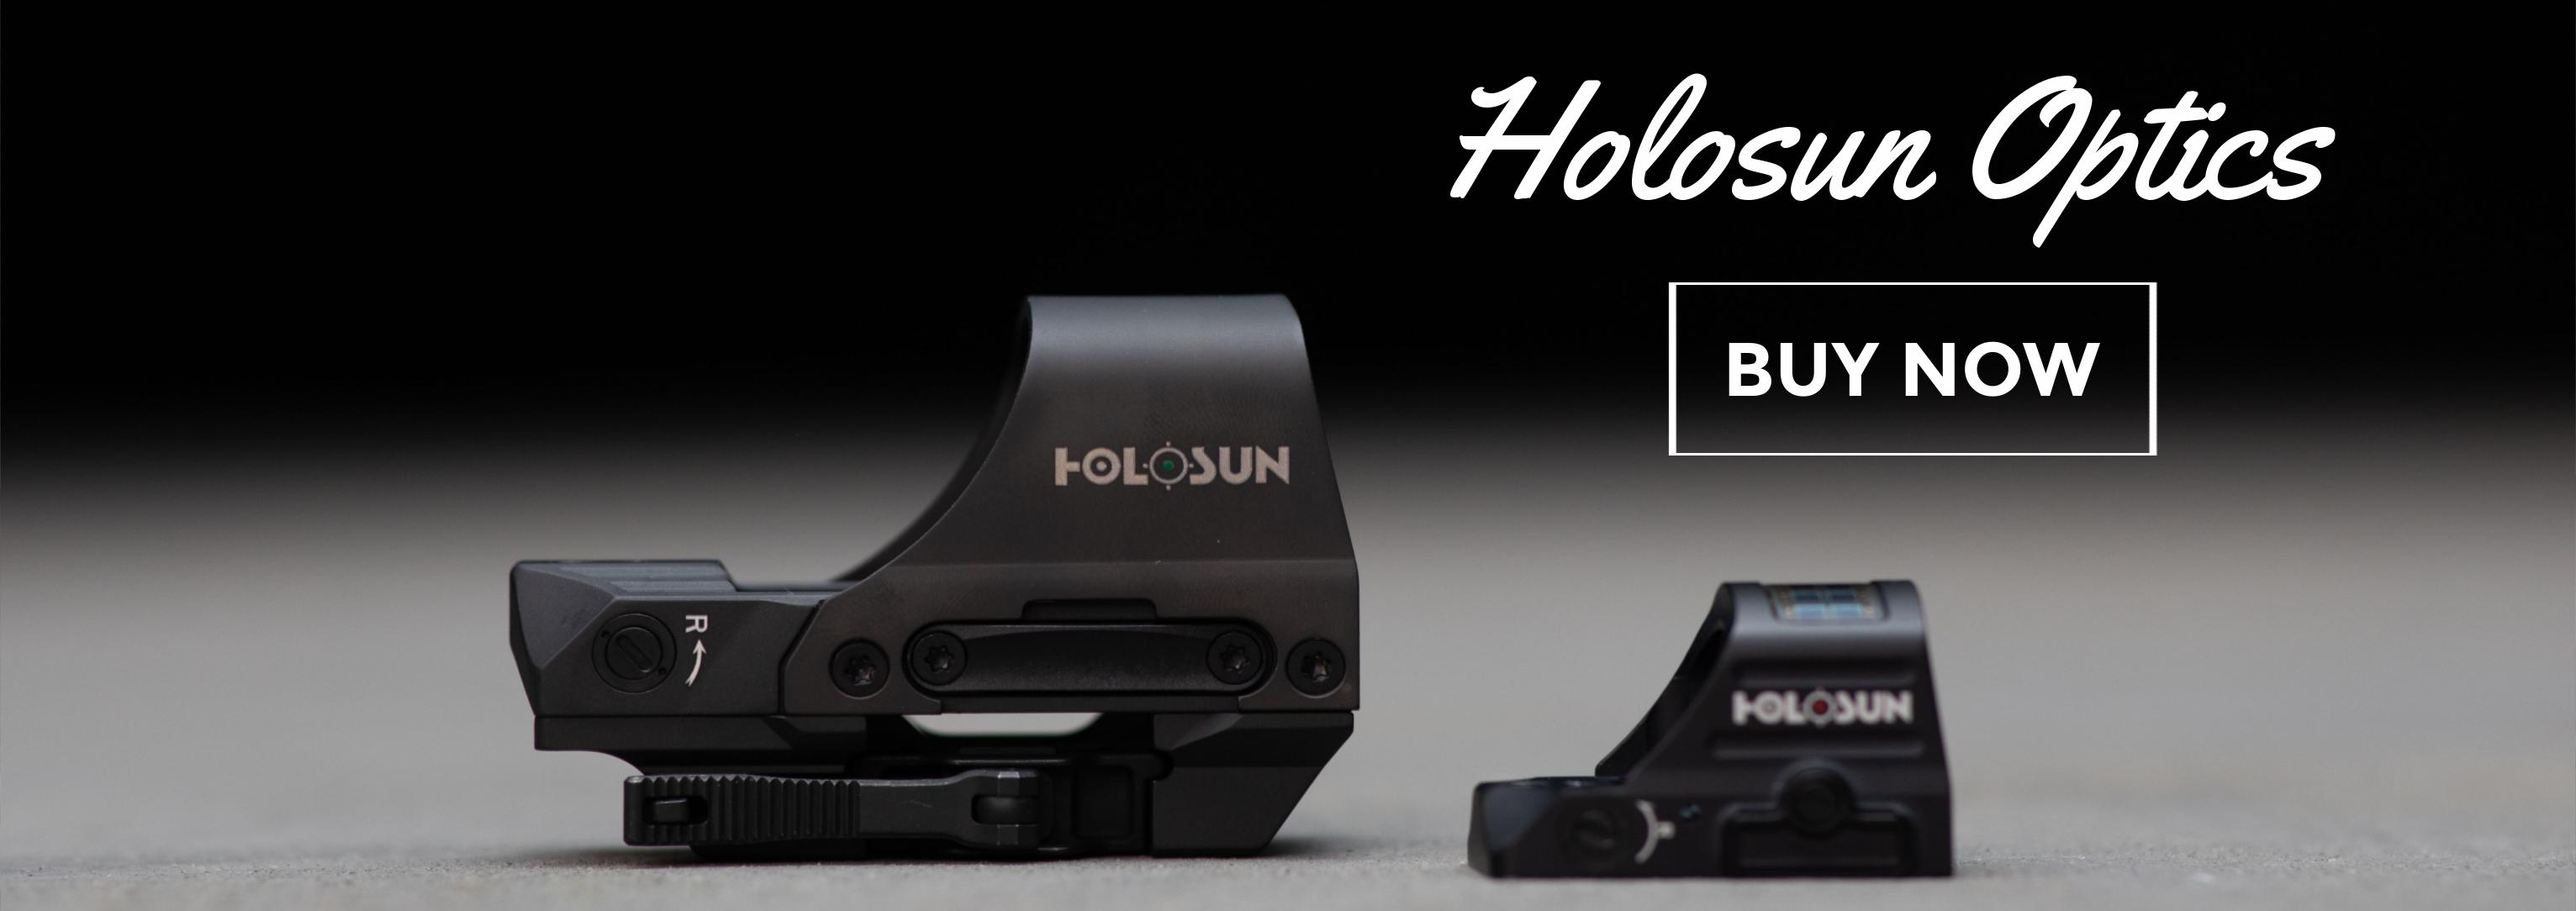 https://store.readygunner.com/search?q=holosun